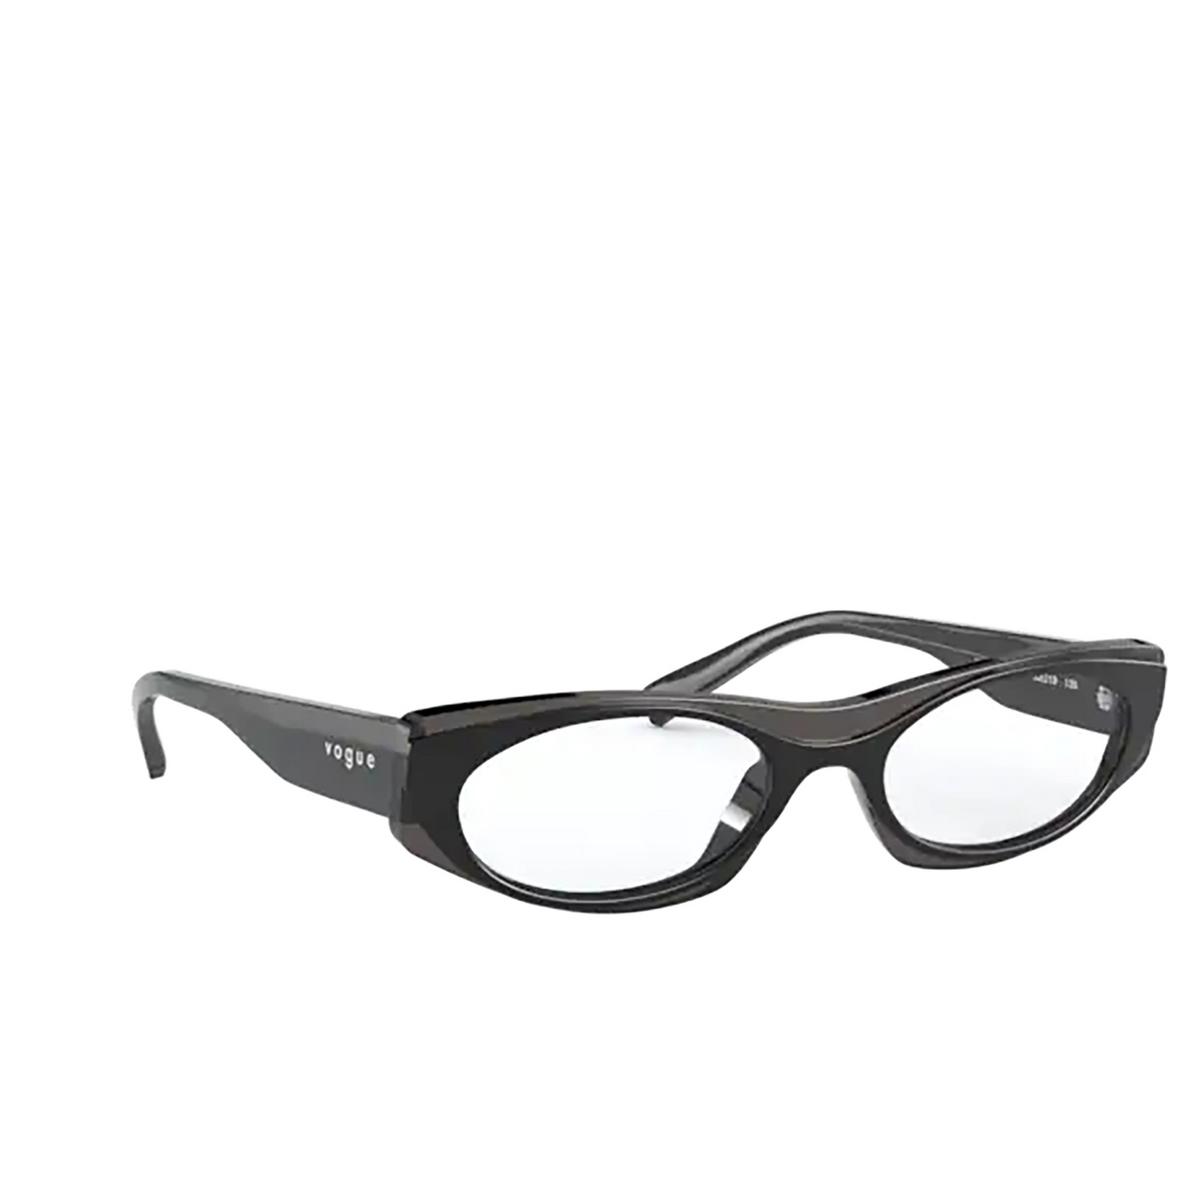 Vogue® Oval Eyeglasses: VO5316 color Top Black / Opal Black 2813 - three-quarters view.